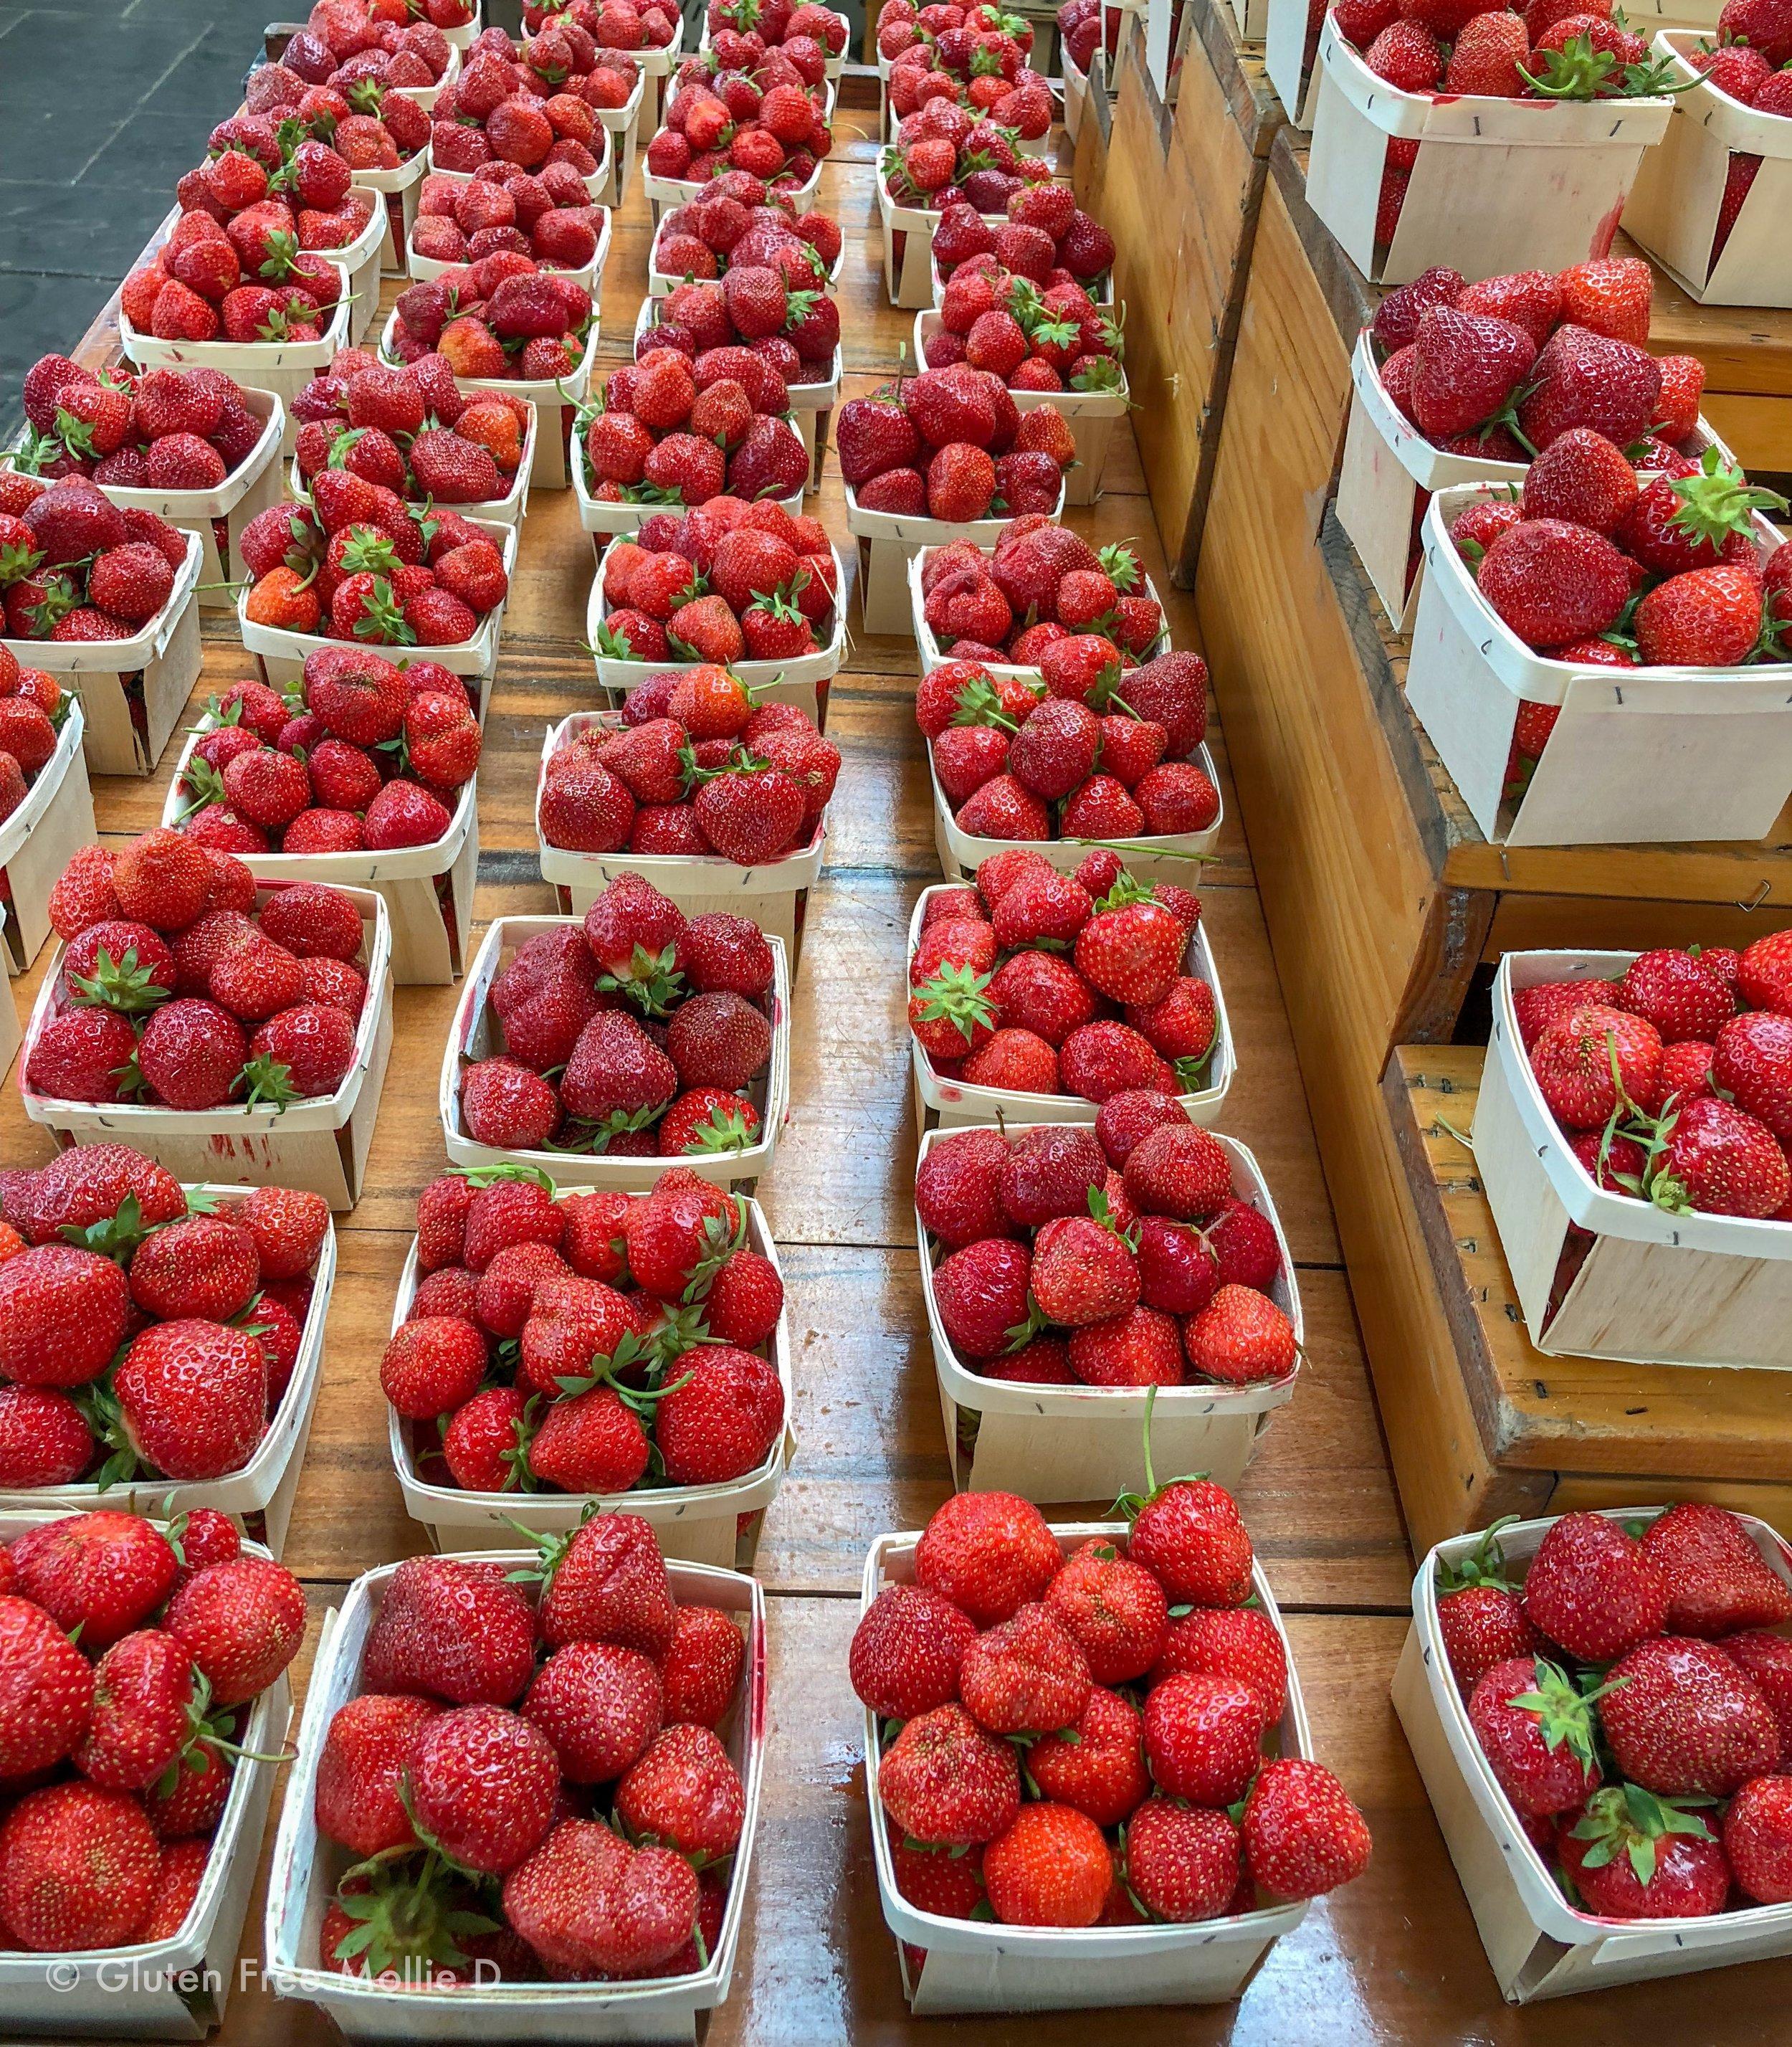 Farm-fresh strawberries picked right at Wilson Farm!